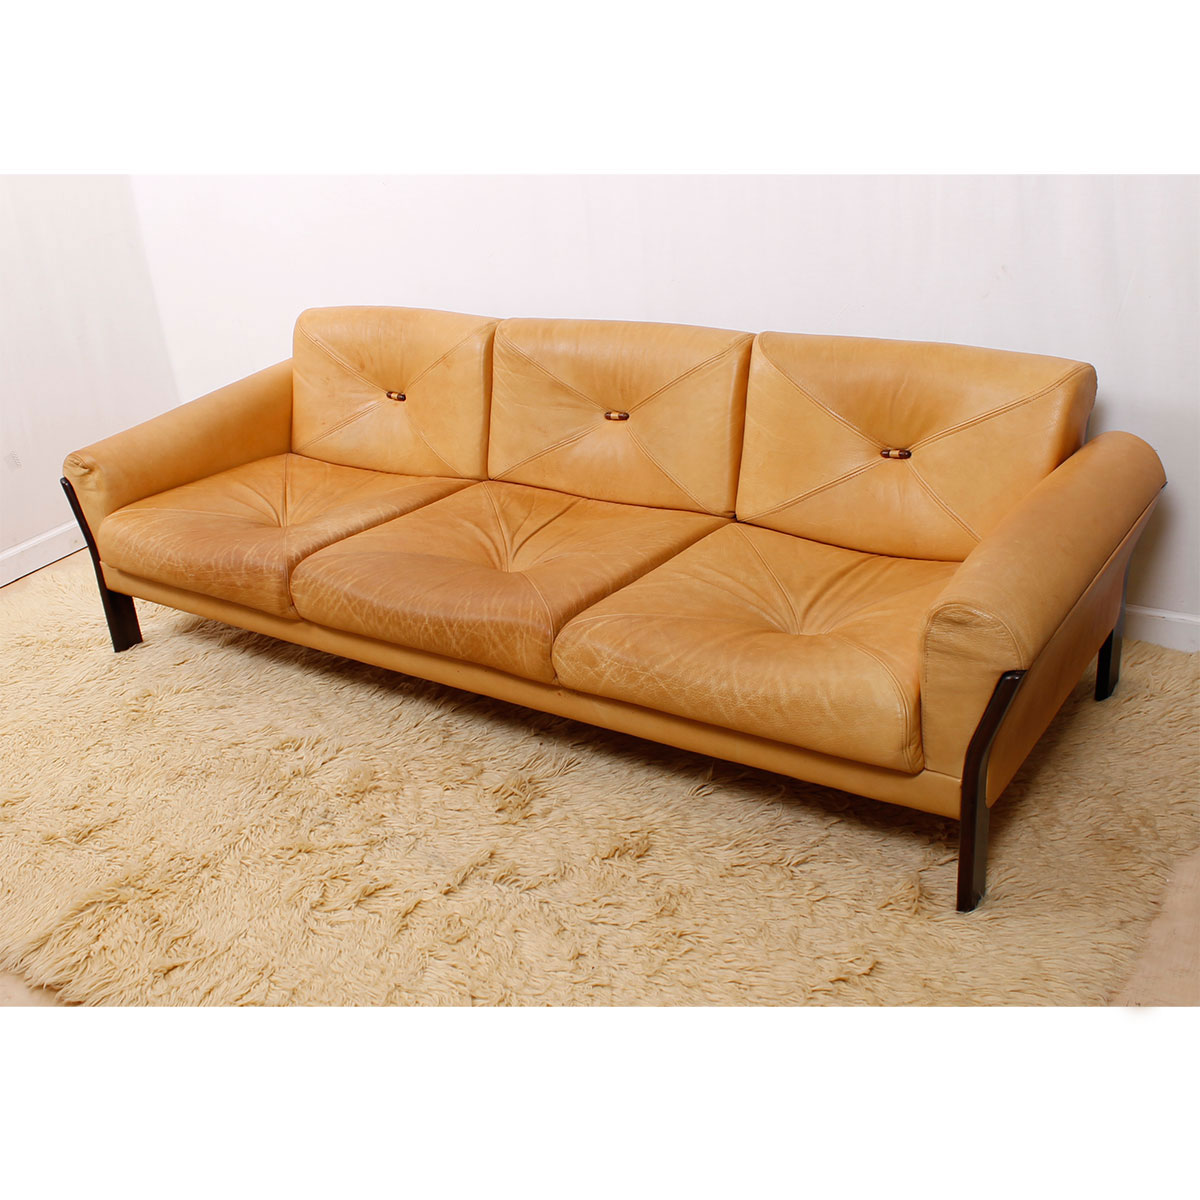 Modern mobler - Designer couch modelle komfort ...